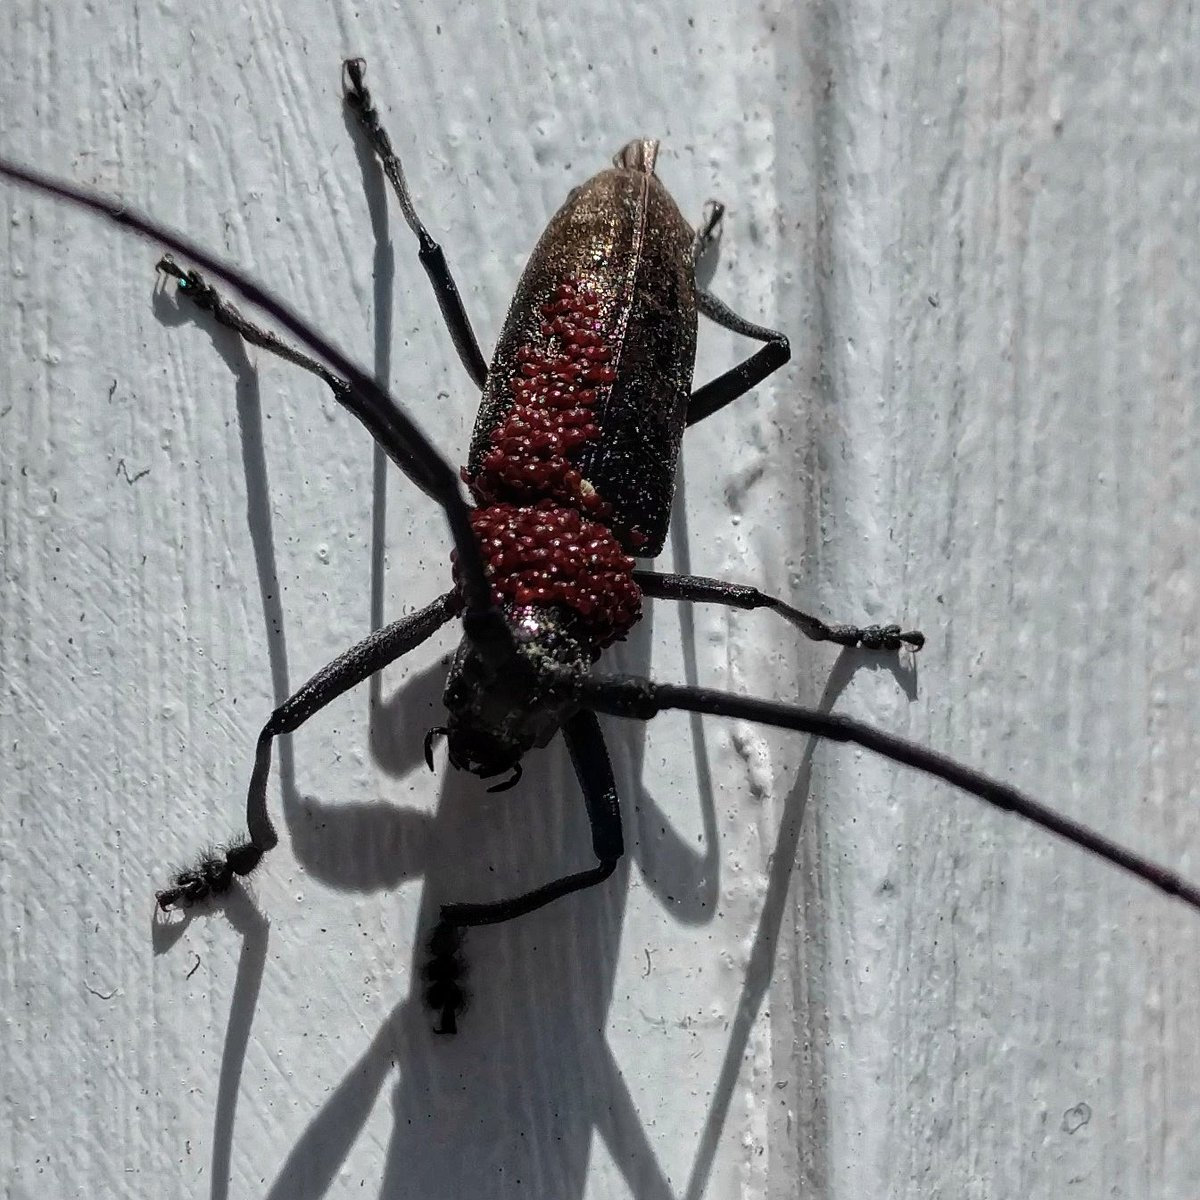 White-spotted Sawyer Beetle (Monochamus scutellatus)  #wildlife #insect #fauna #beetle #sawyerbeetle #monochamus #longhornbeetlefamily #cerambycidae